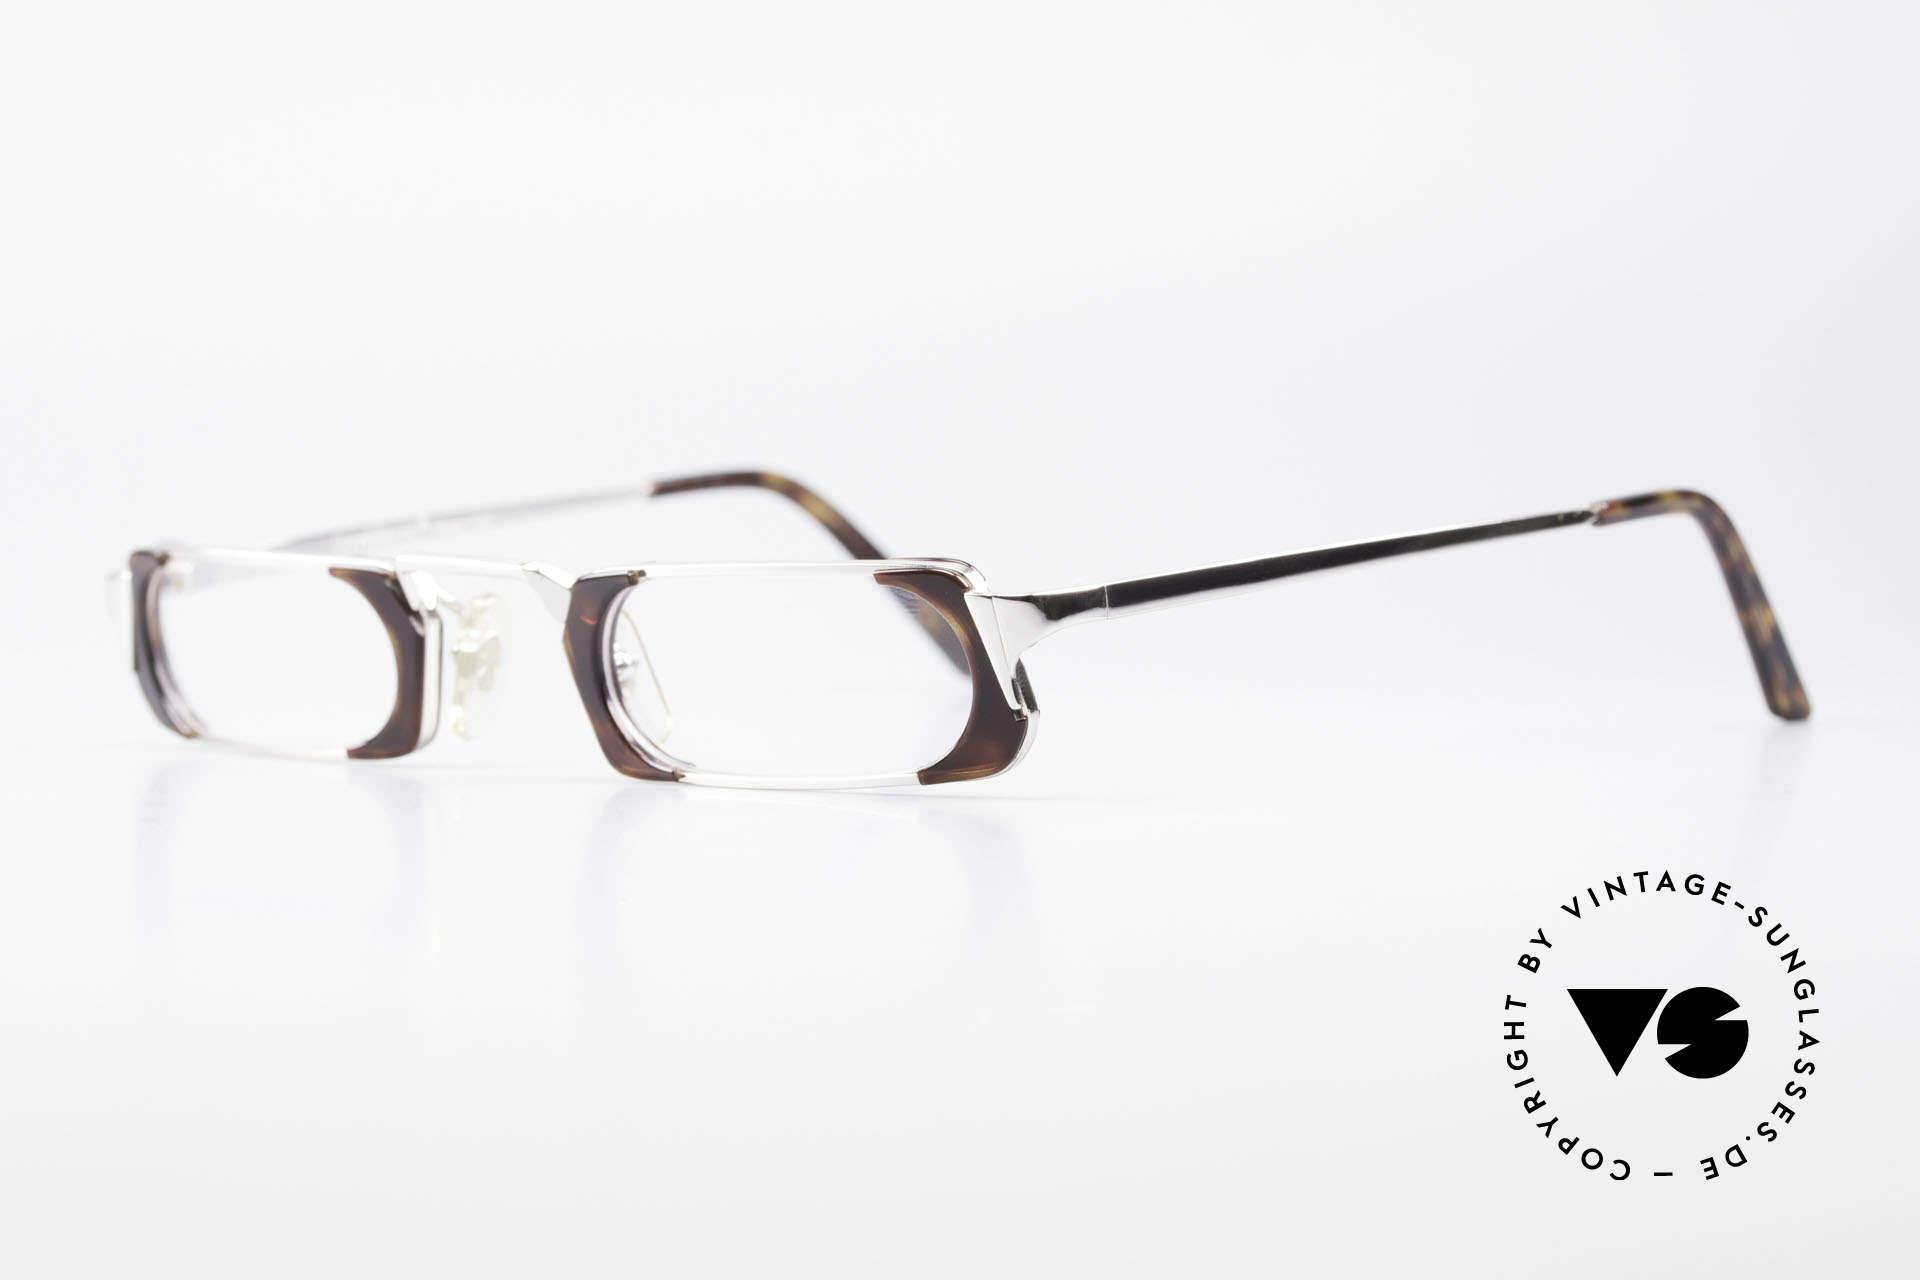 Gianni Versace 833 Striking Reading Eyeglasses, unisex eyeglasses: distinctive but stylish & very rare, Made for Men and Women